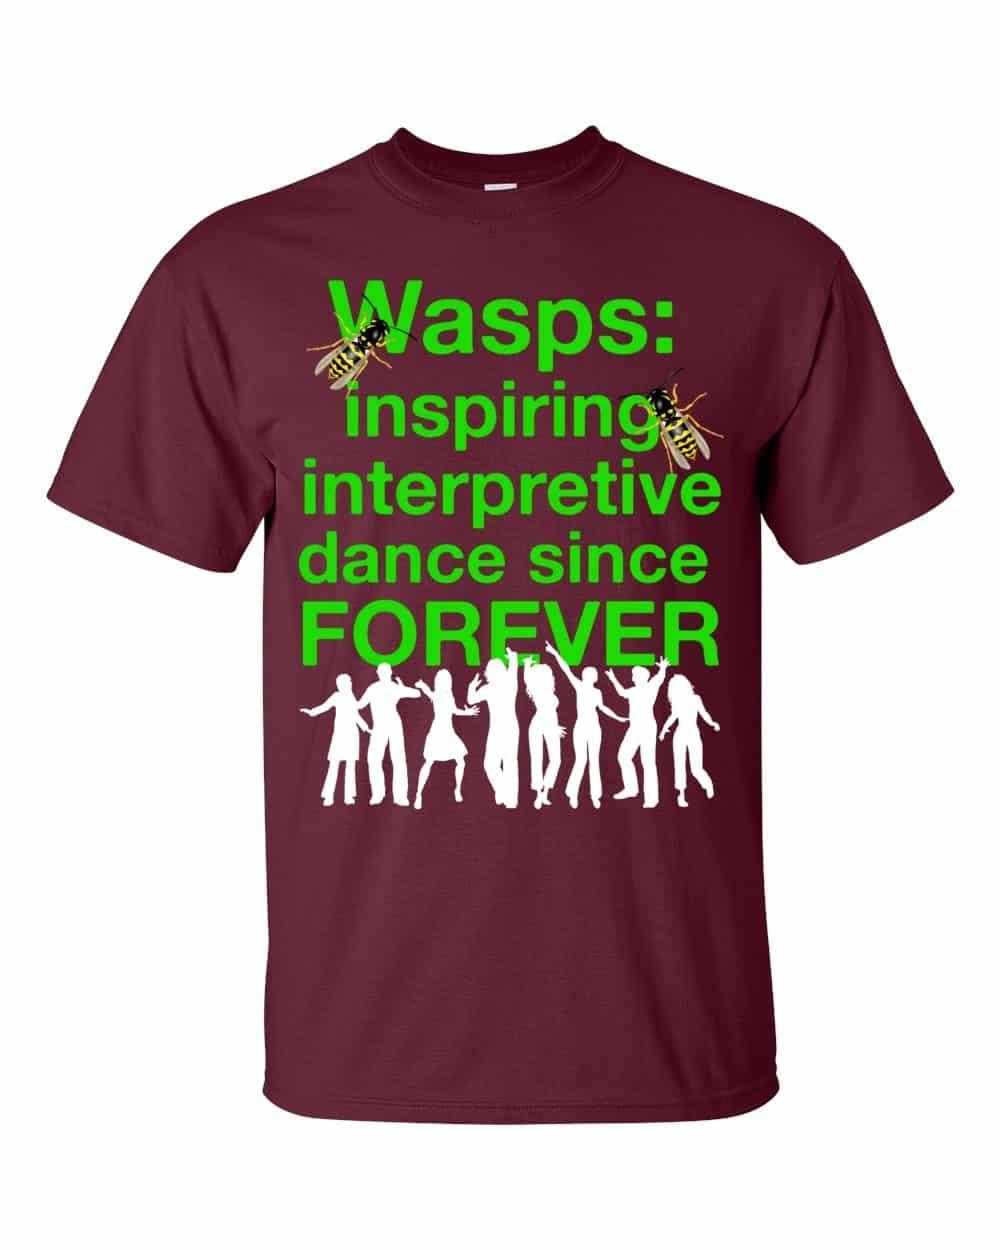 Wasps Inspire Interpretive Dance T-Shirt (maroon)